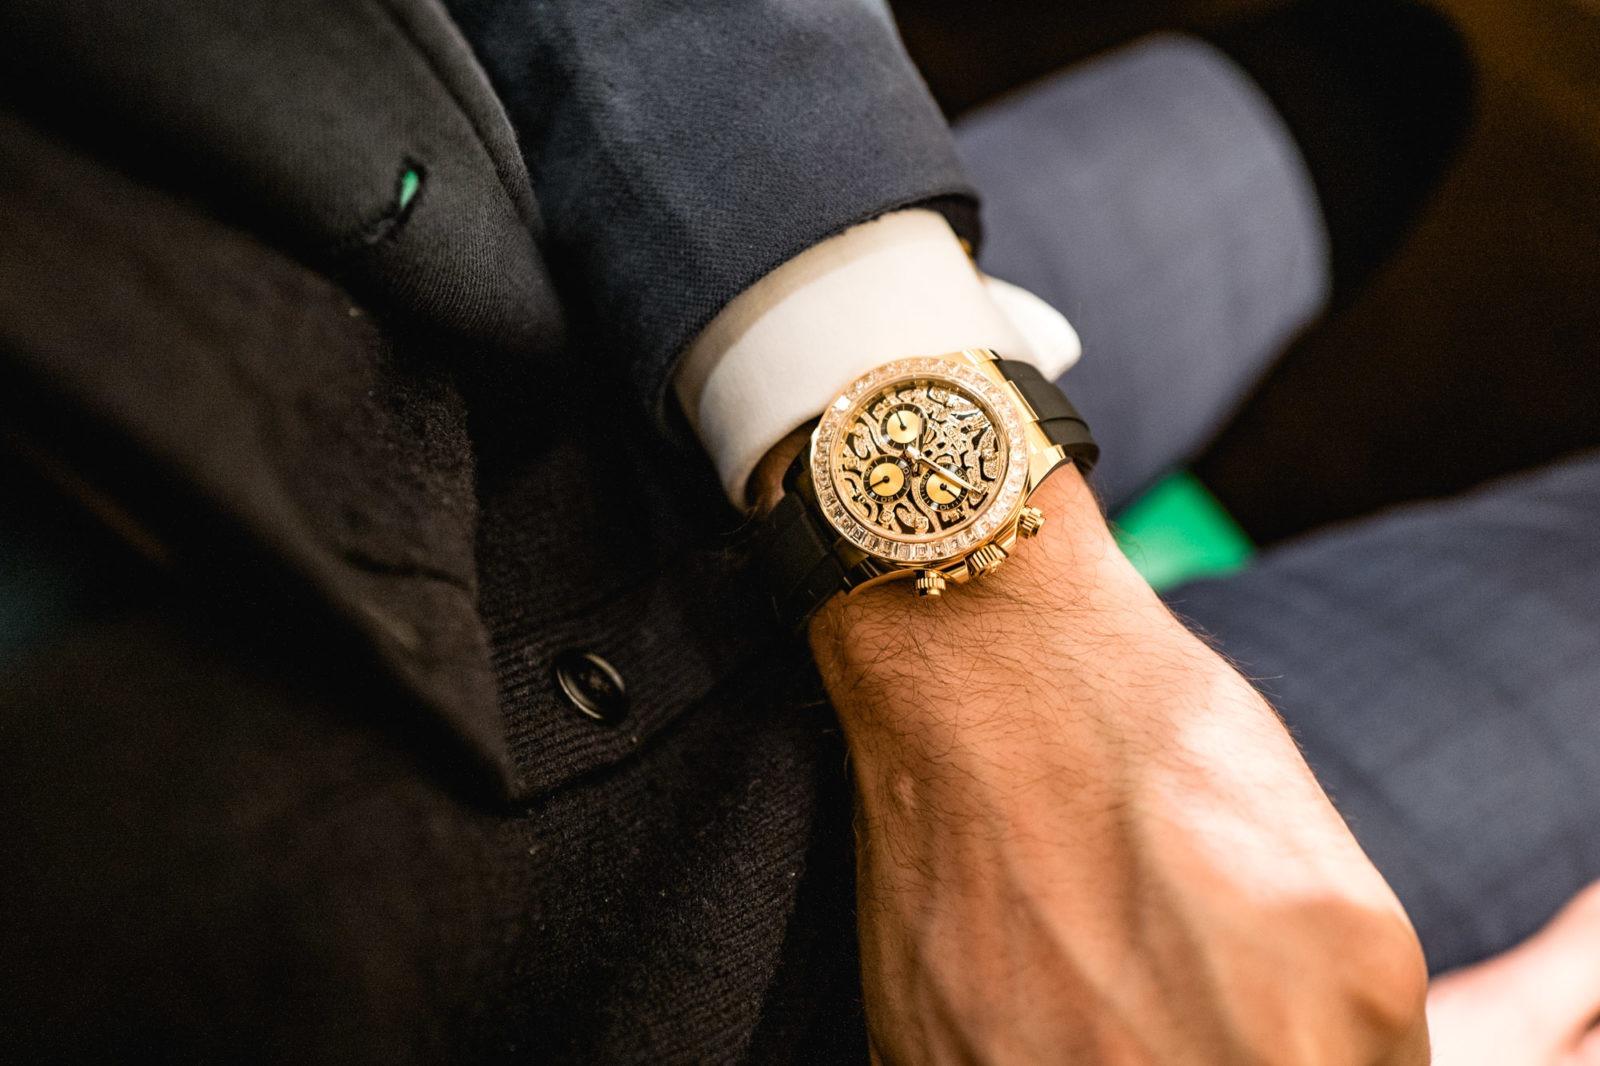 Rolex Cosmograph Daytona - Baselworld 2019